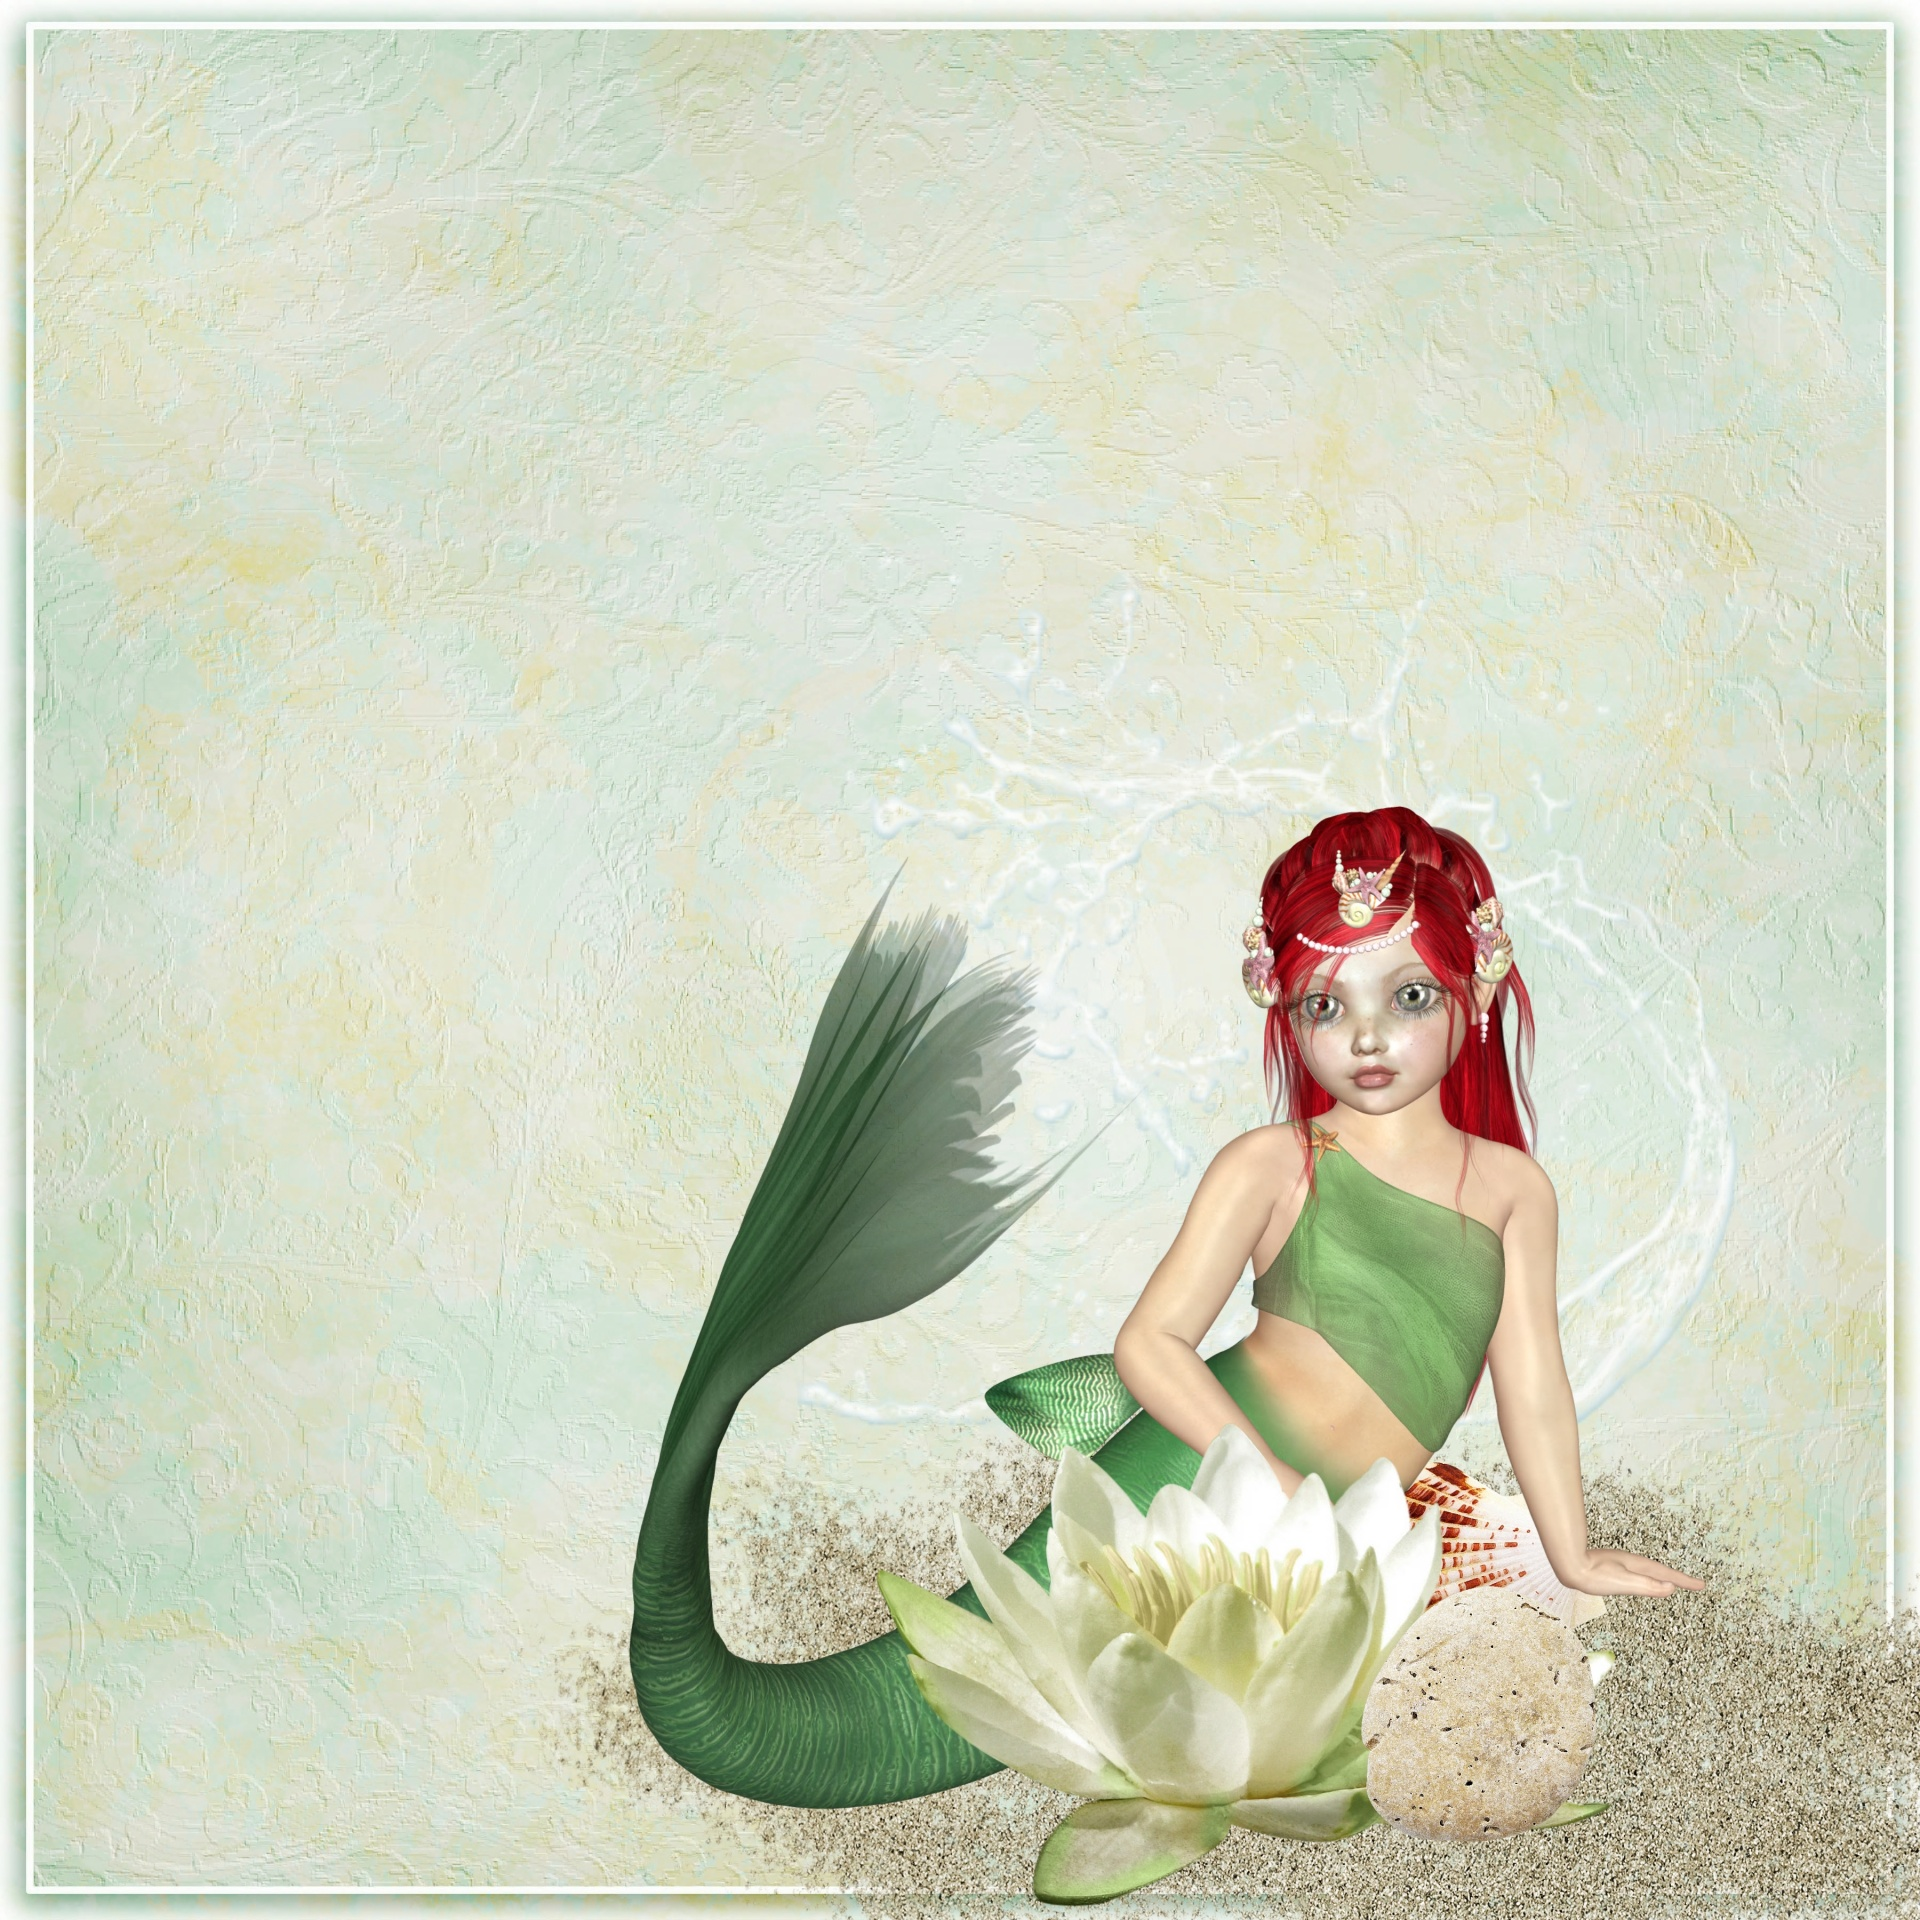 Mermaidkidsfantasylotusflower Free Photo From Needpixcom